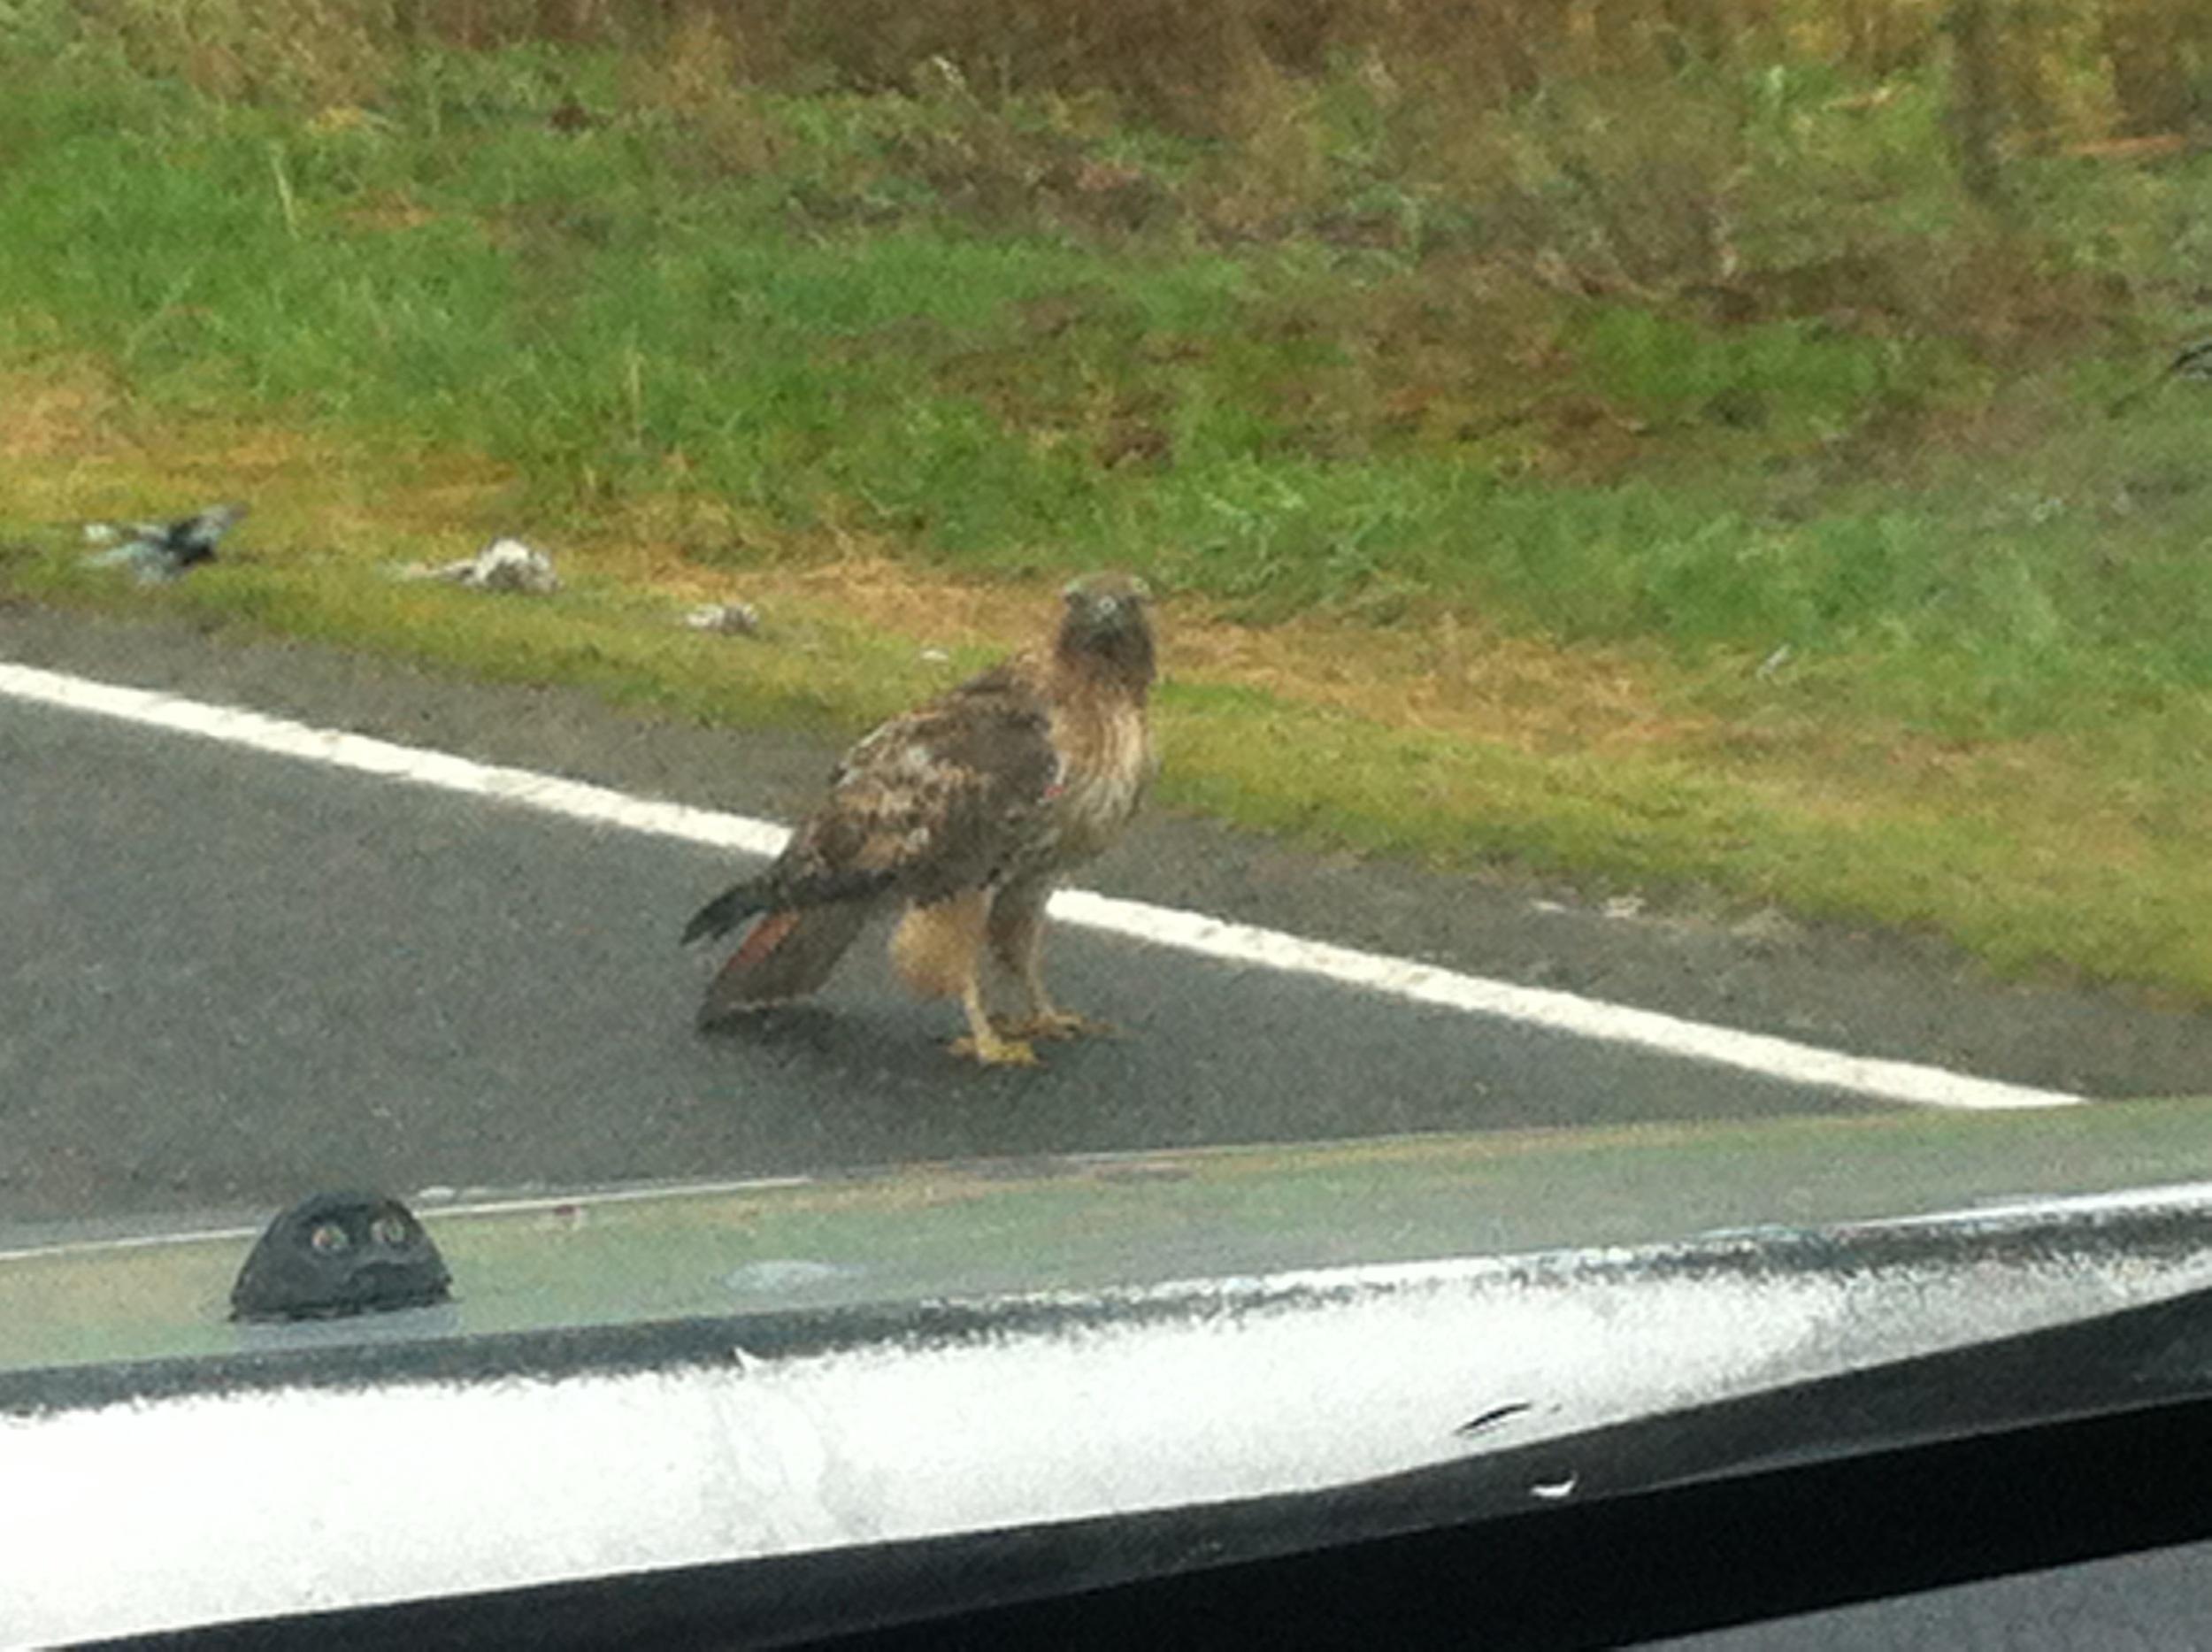 Good morning, Mr. Hawk.